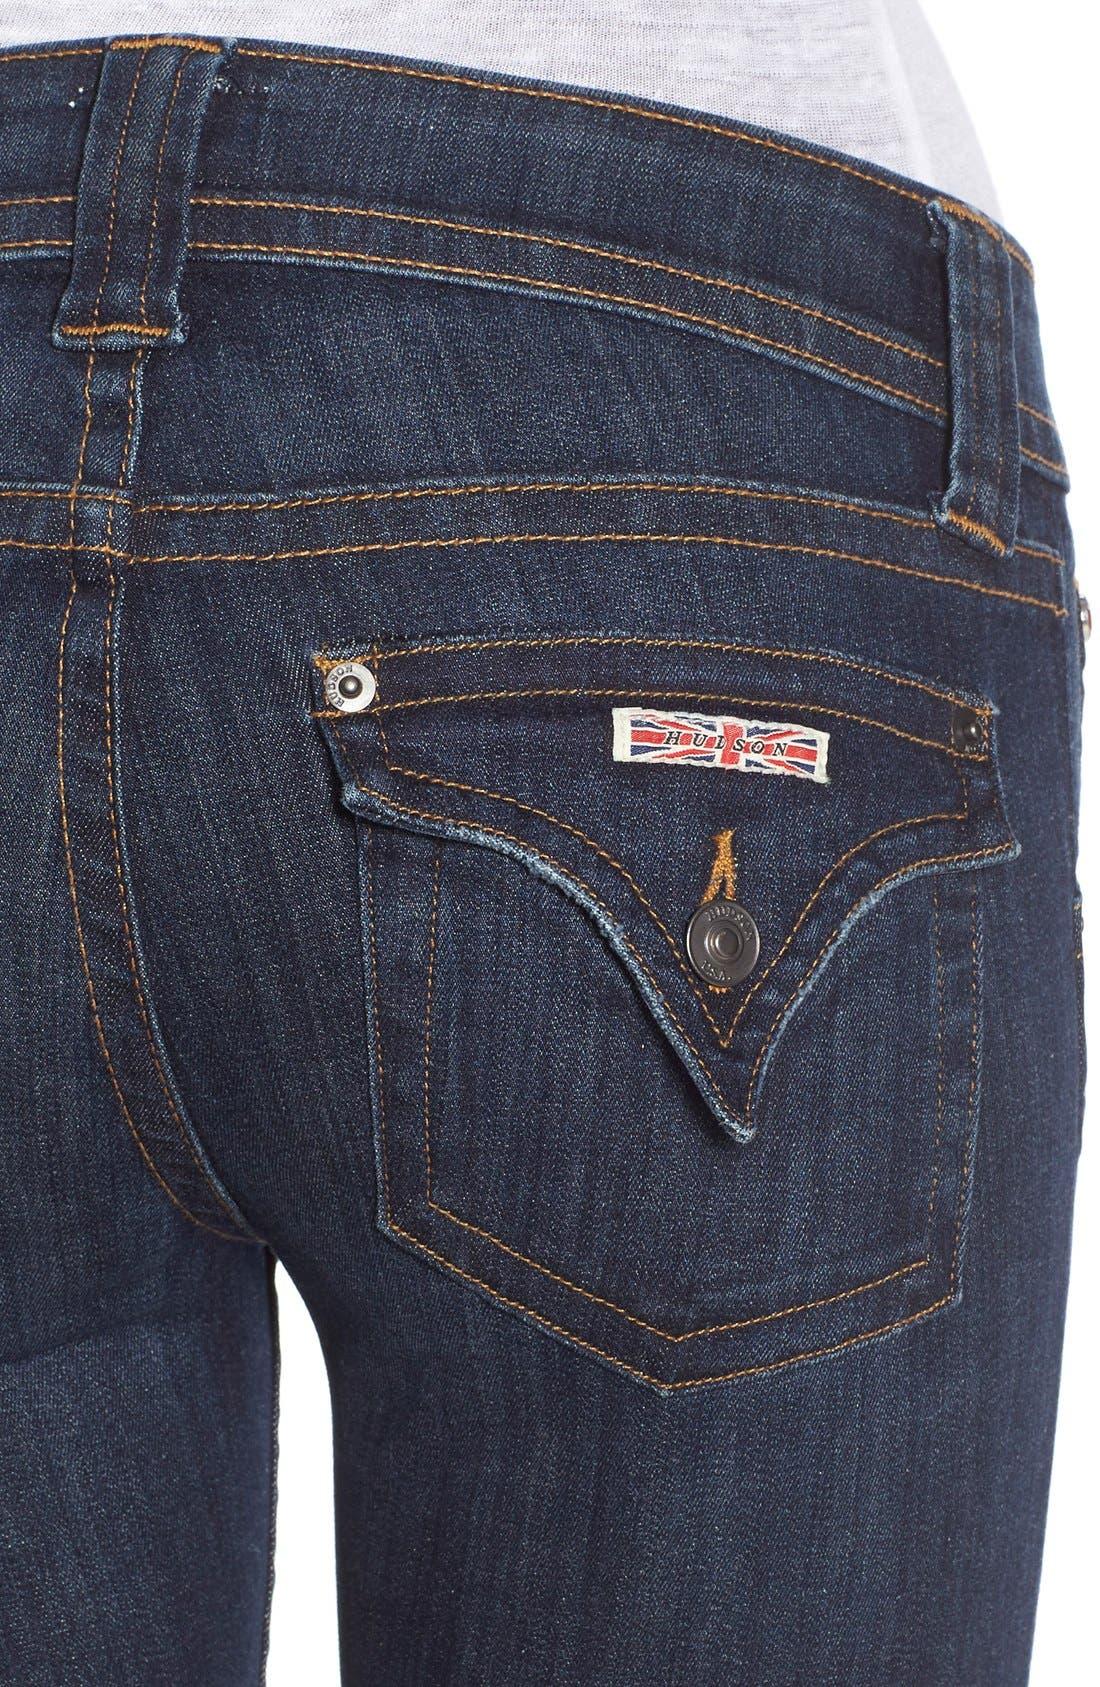 'Palerme' Cuff Bemuda Shorts,                             Alternate thumbnail 4, color,                             Elemental